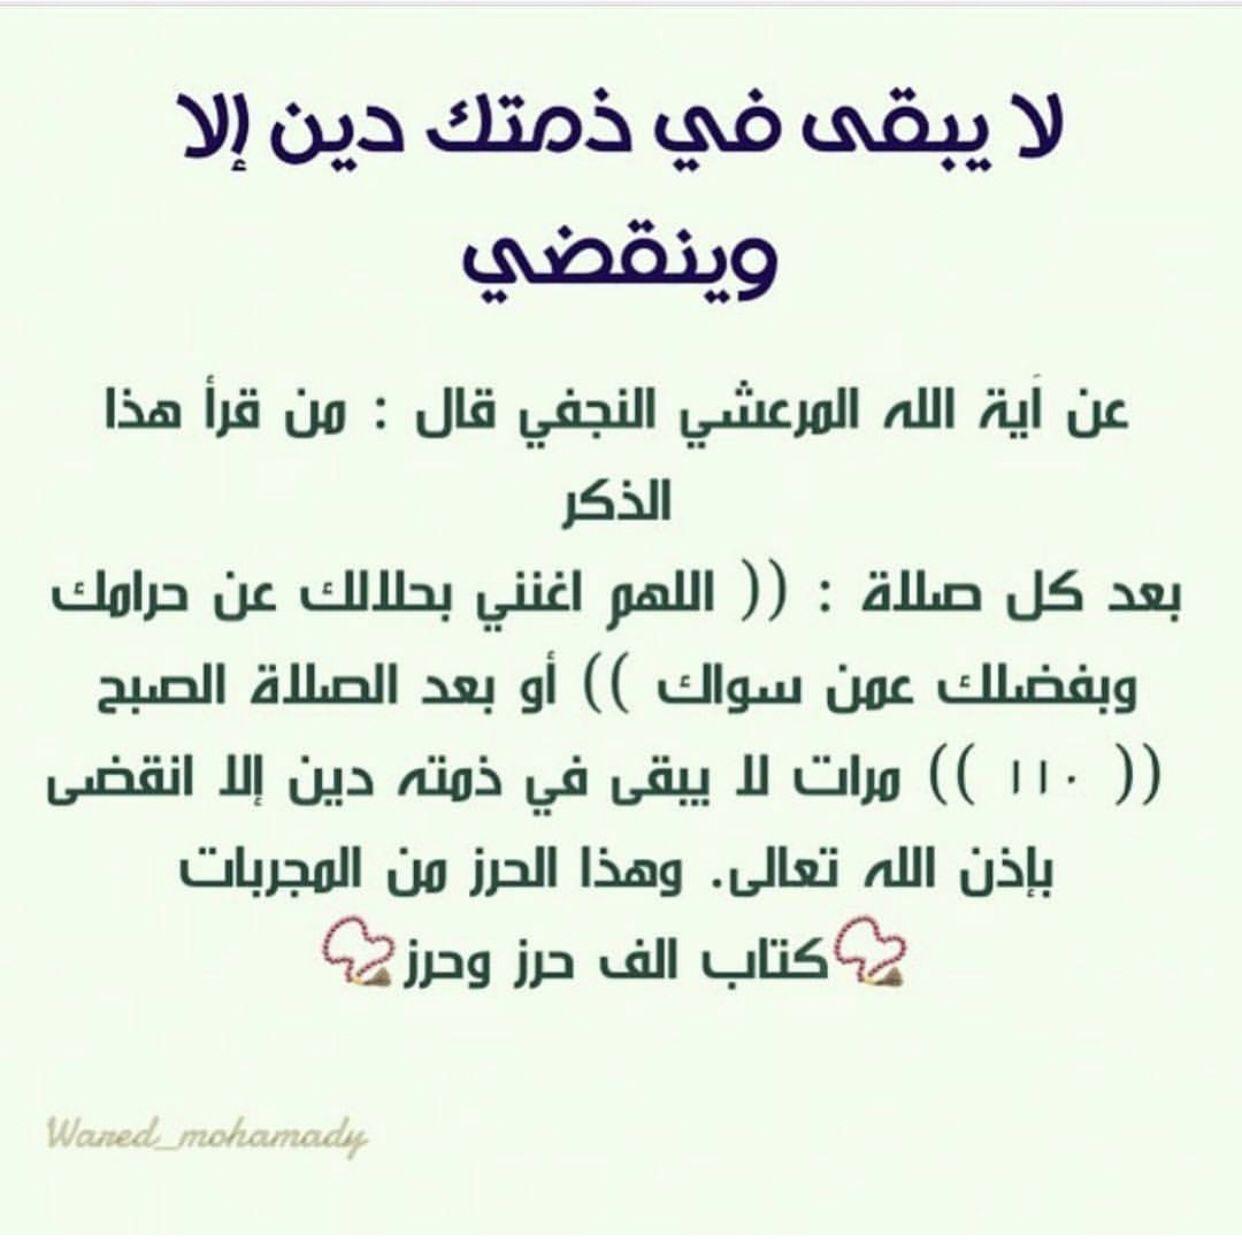 Pin By فاطمة الصافي الموسوي On علي صراط الله Islam Facts Islamic Inspirational Quotes Beautiful Quran Quotes